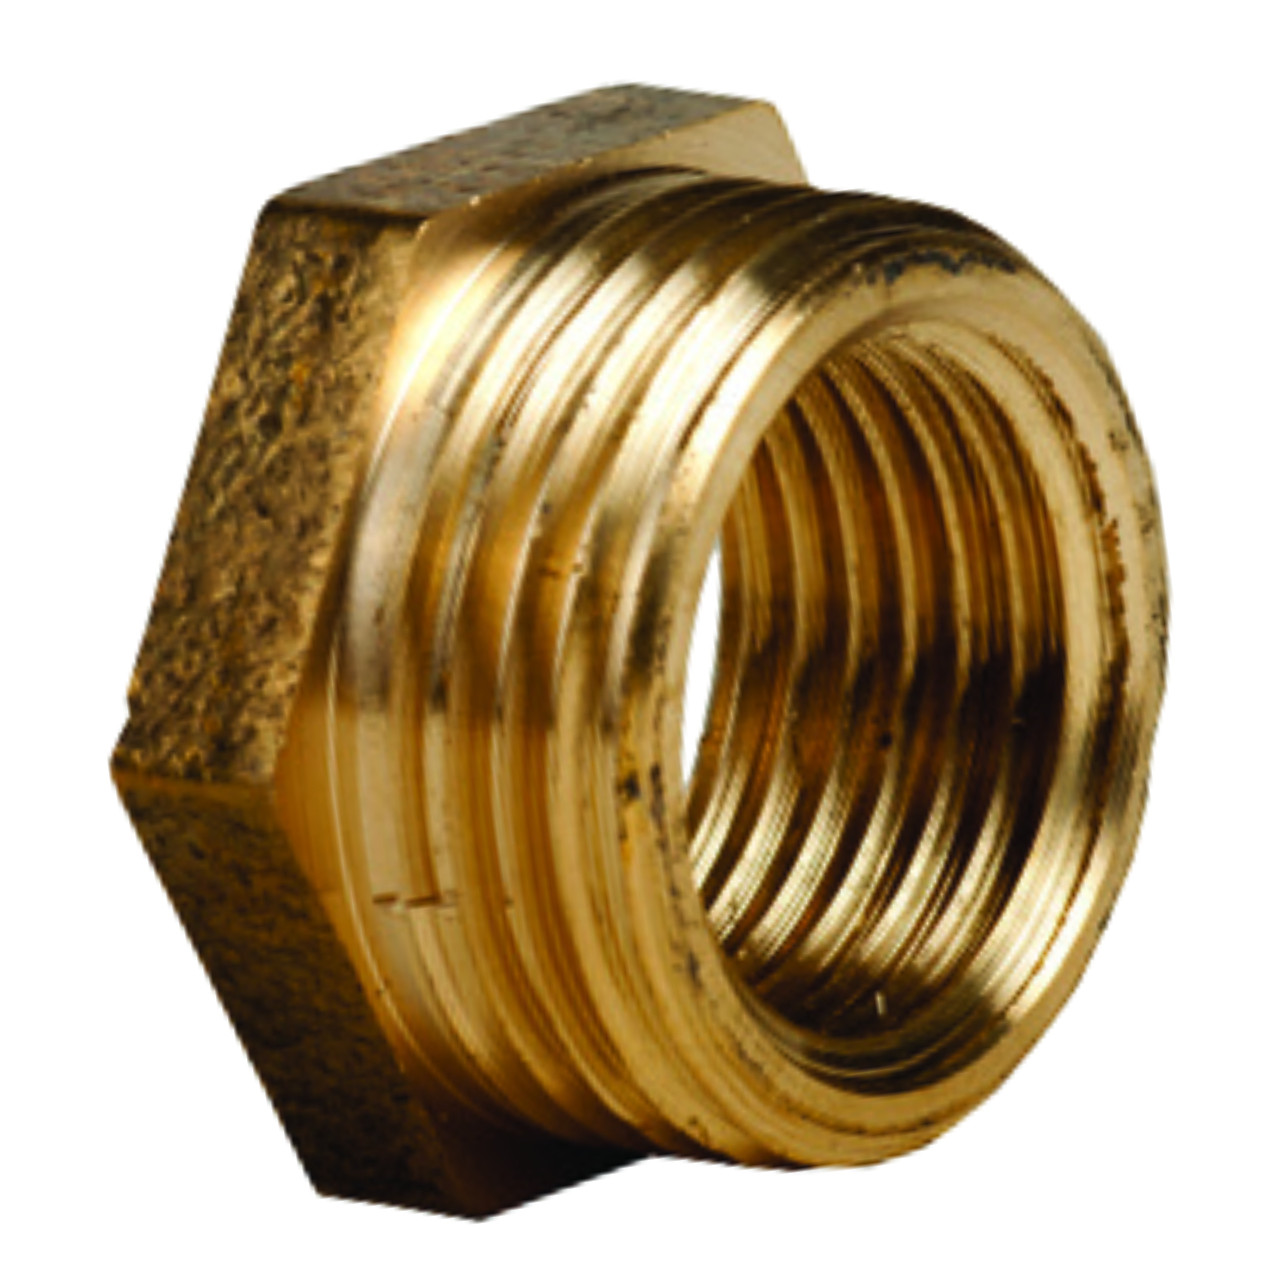 "042 1""x1/2"" Brass Reducing Bush MI x FI"